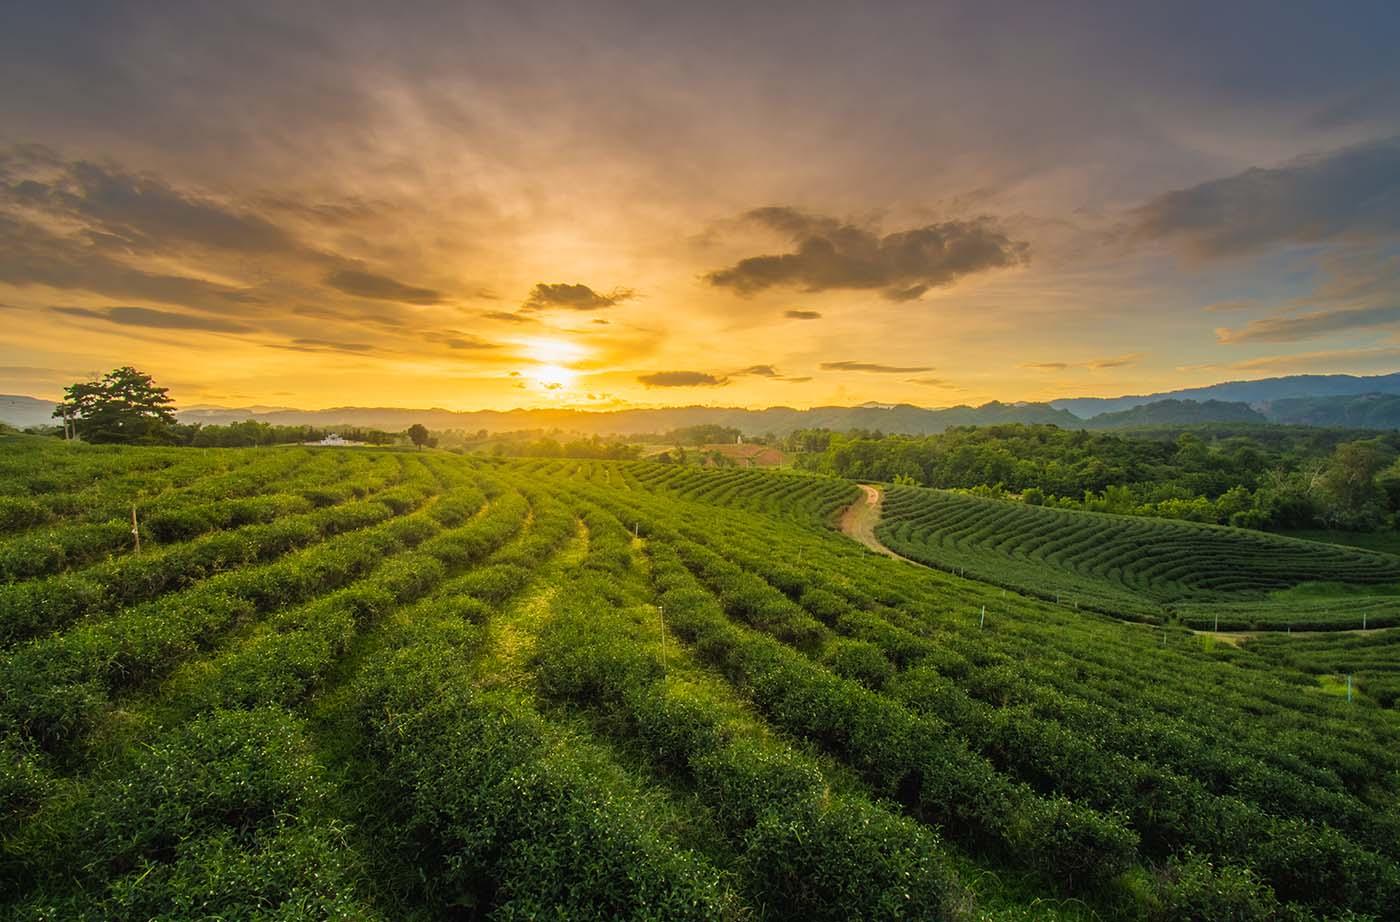 O que é agrobiodiversidade funcional?